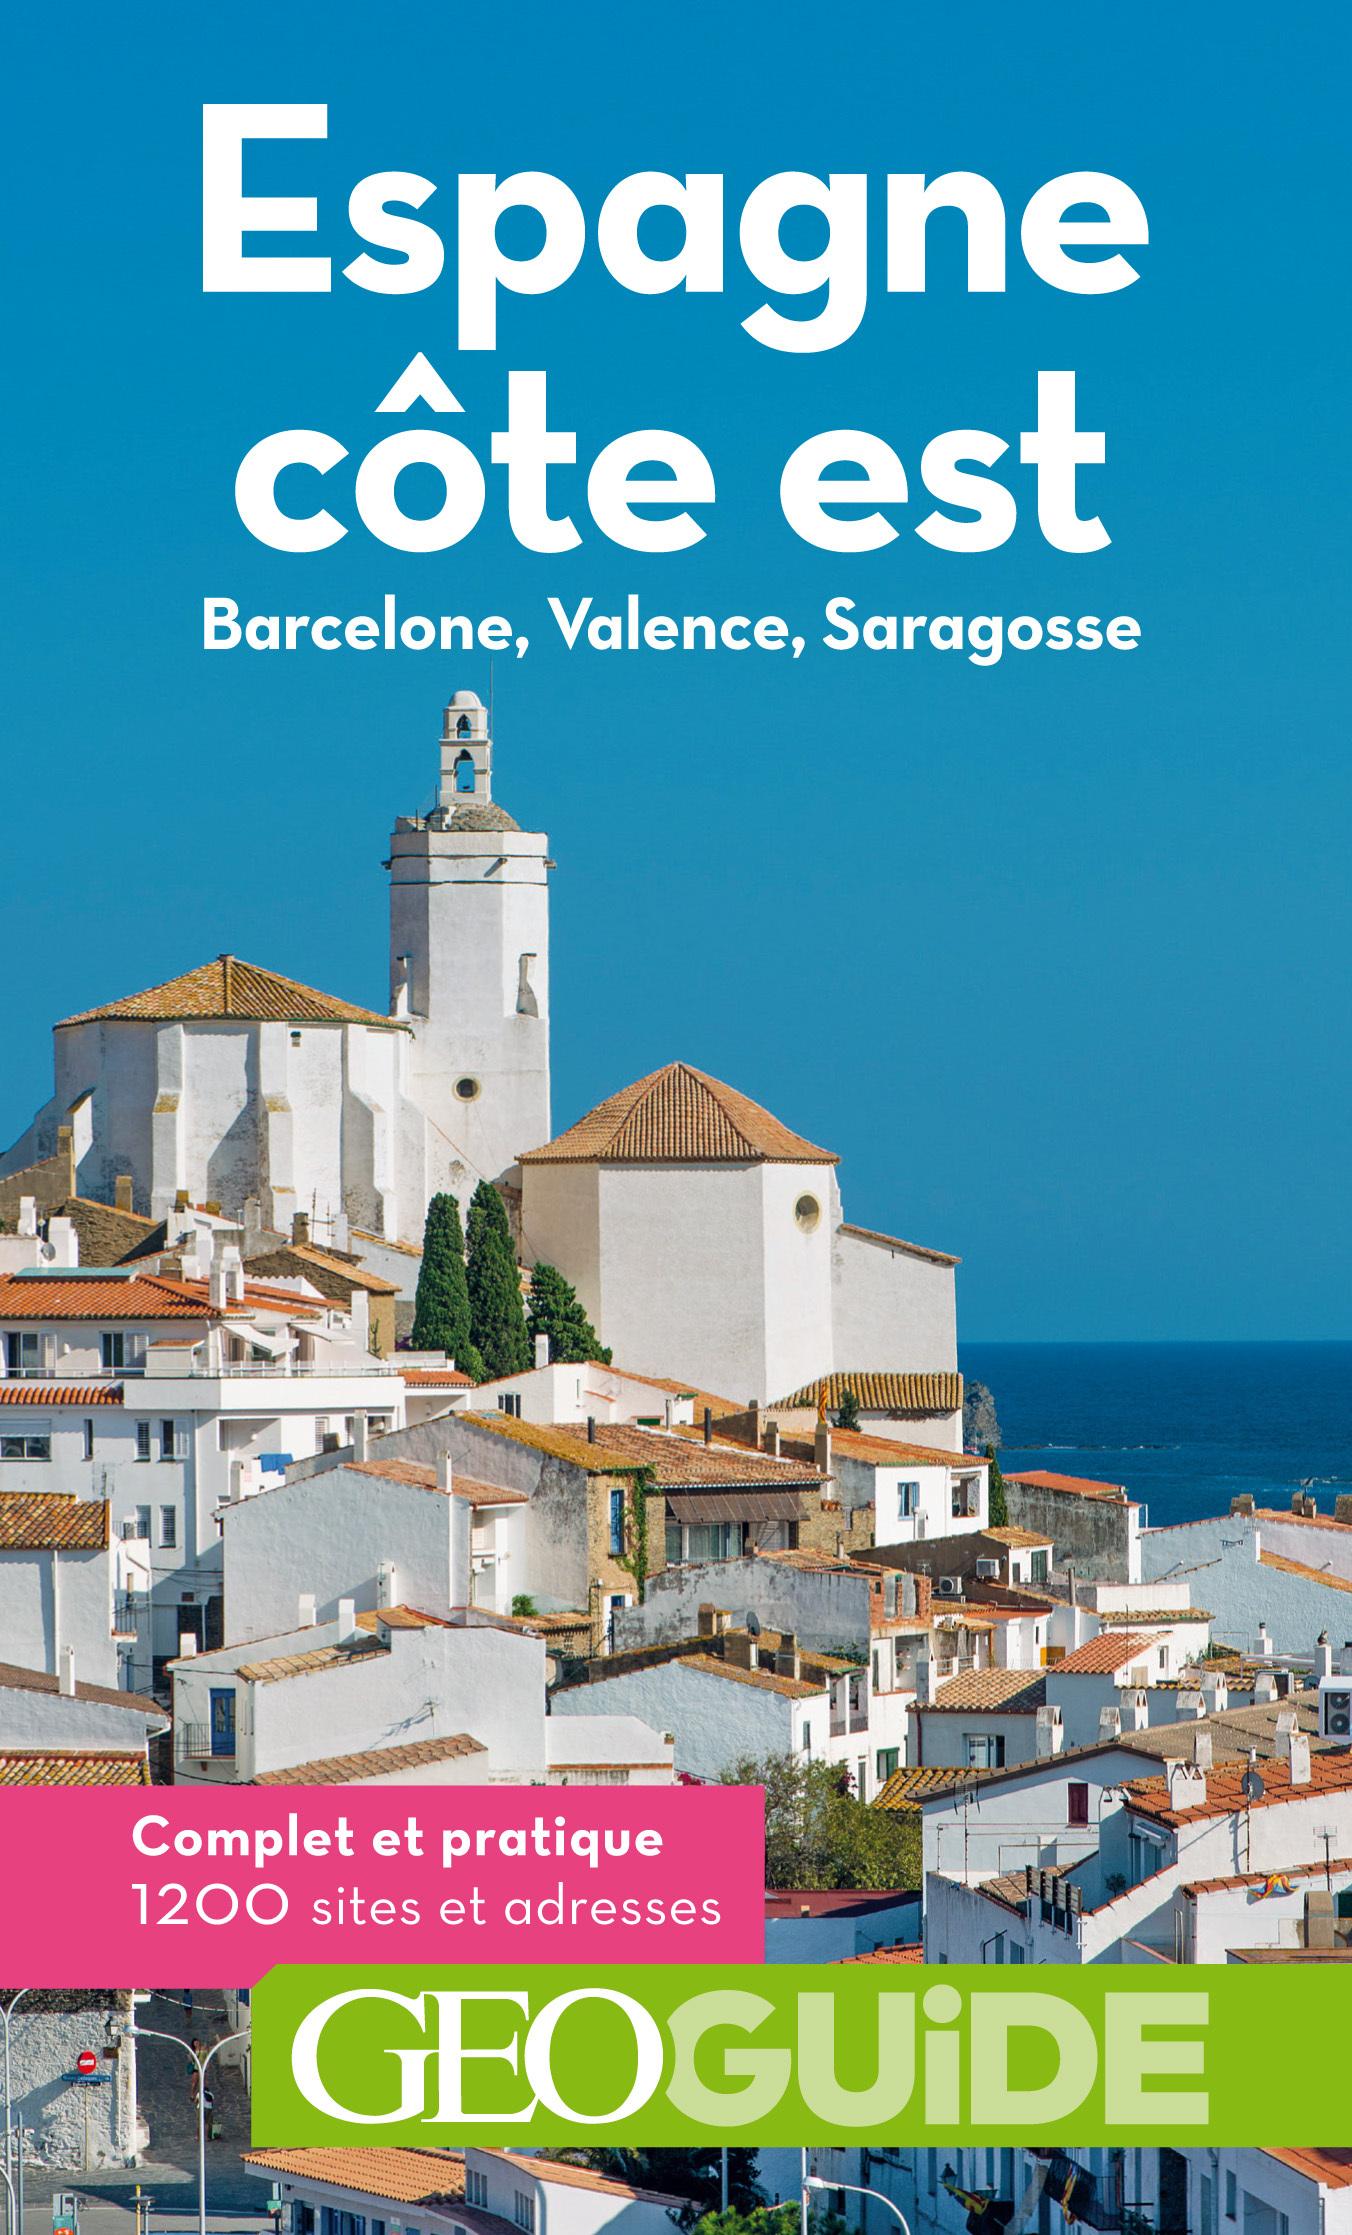 ESPAGNE, COTE EST - BARCELONE, VALENCE, SARAGOSSE